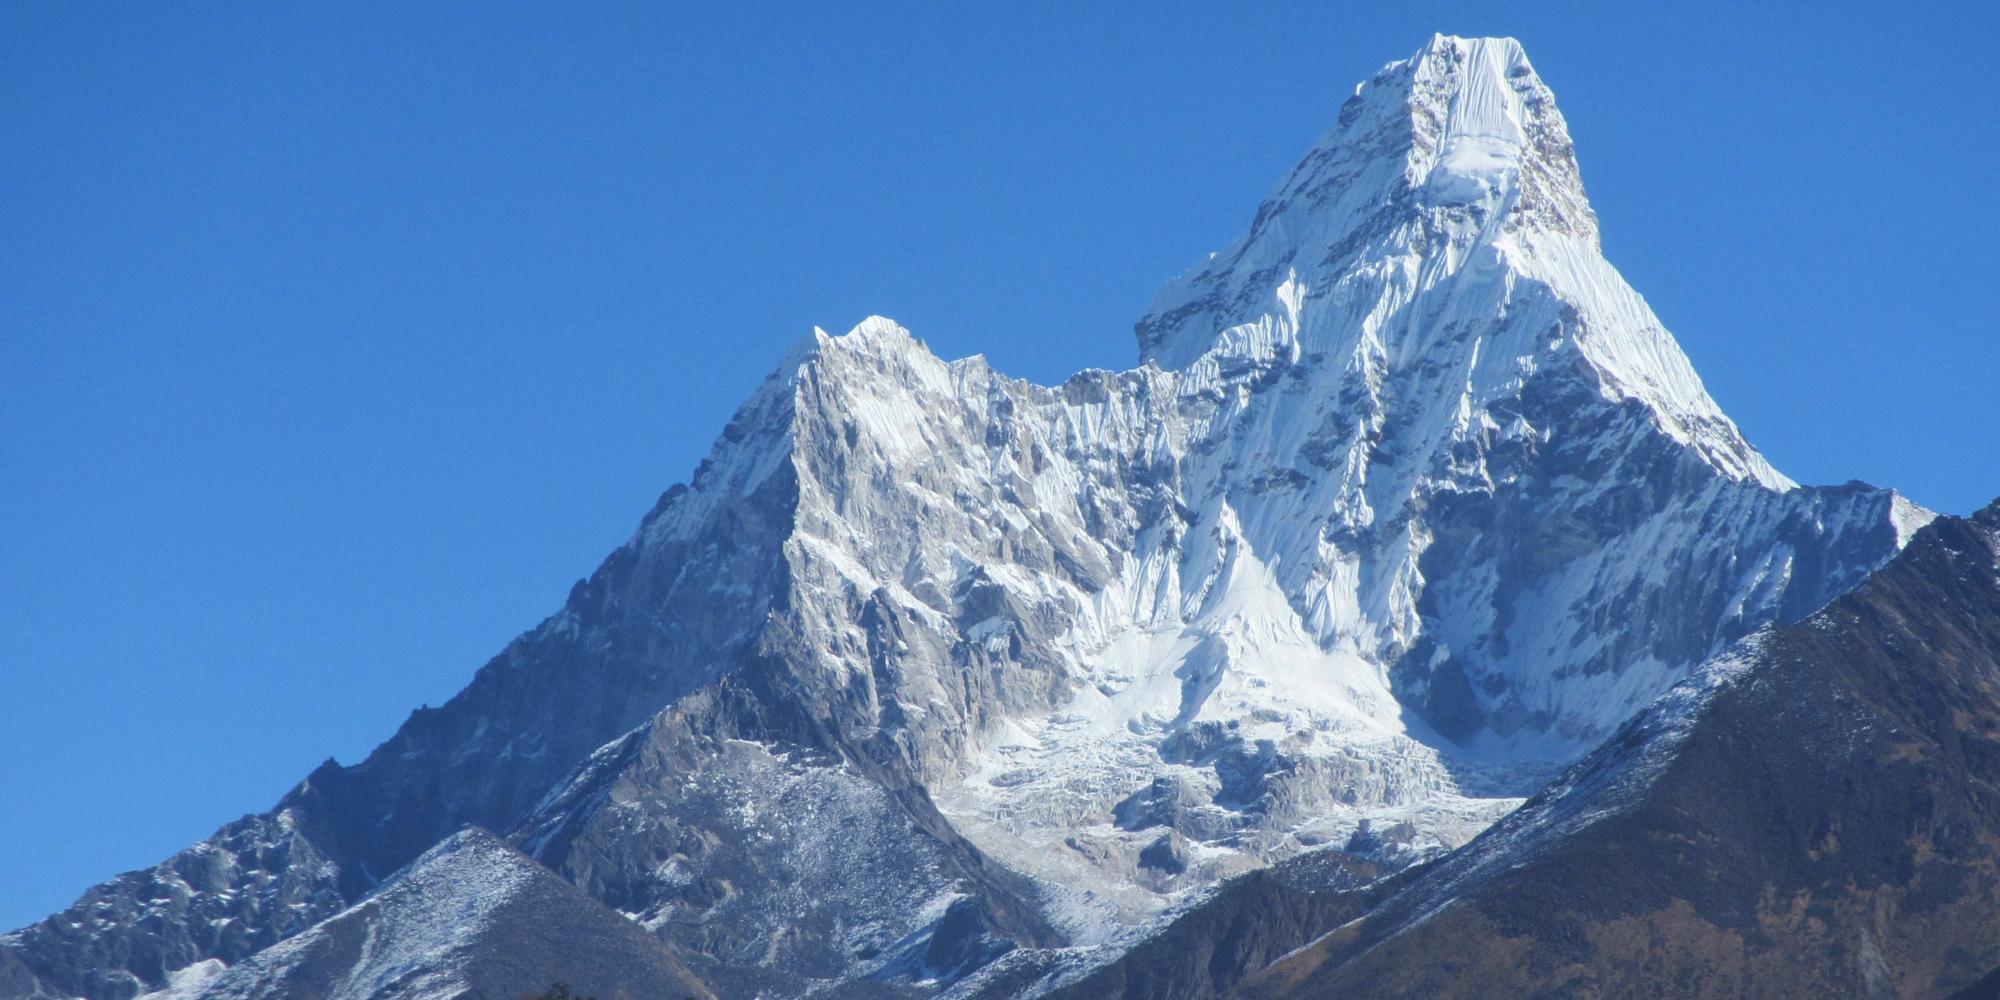 Gokyo Lake Everest Base Camp Trekking